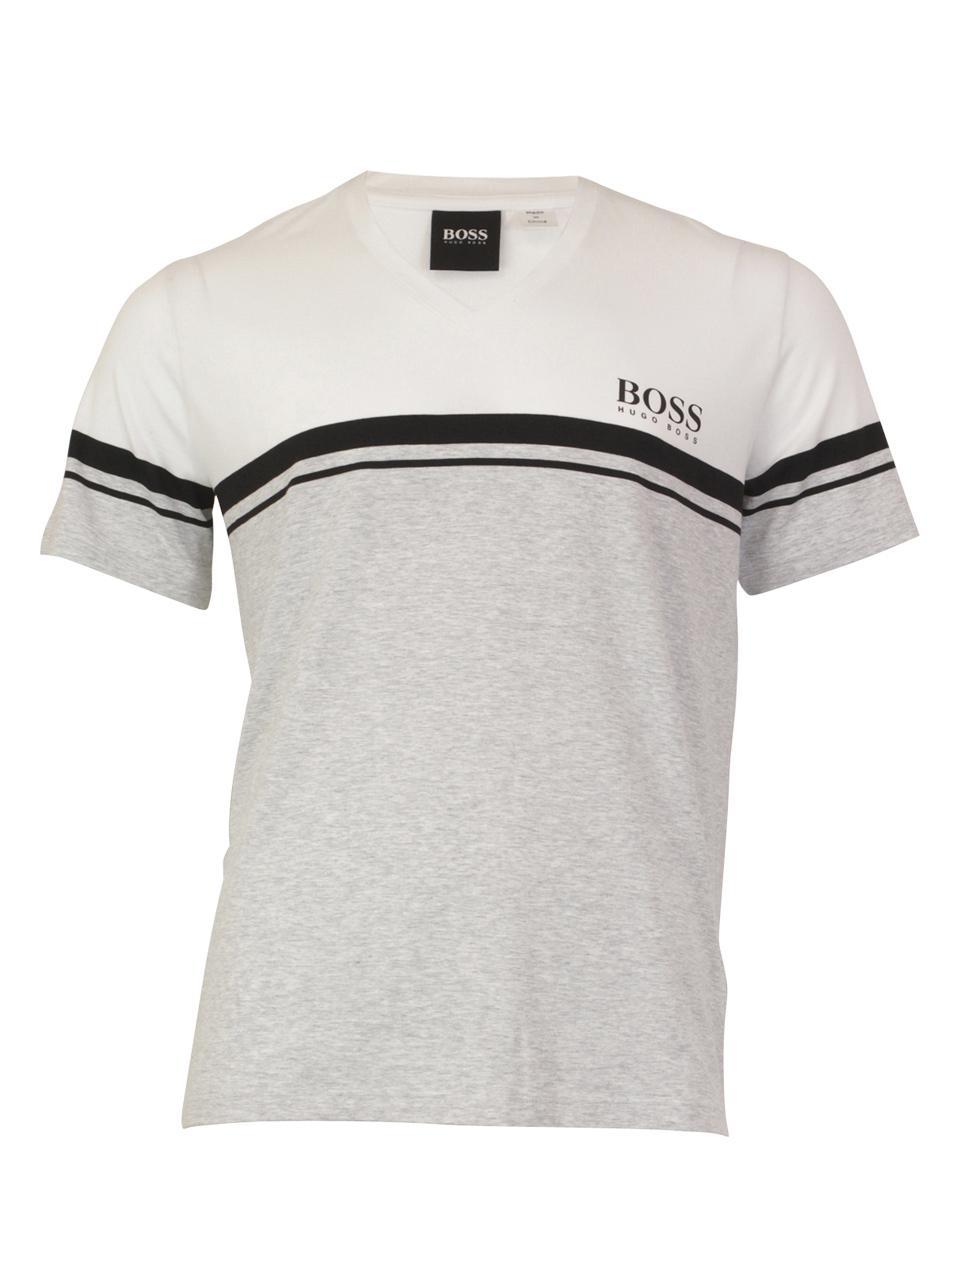 a9e9b75b8 Hugo Boss Men's Bamboo-T-Shirt-VN Short Sleeve V-Neck T-Shirt